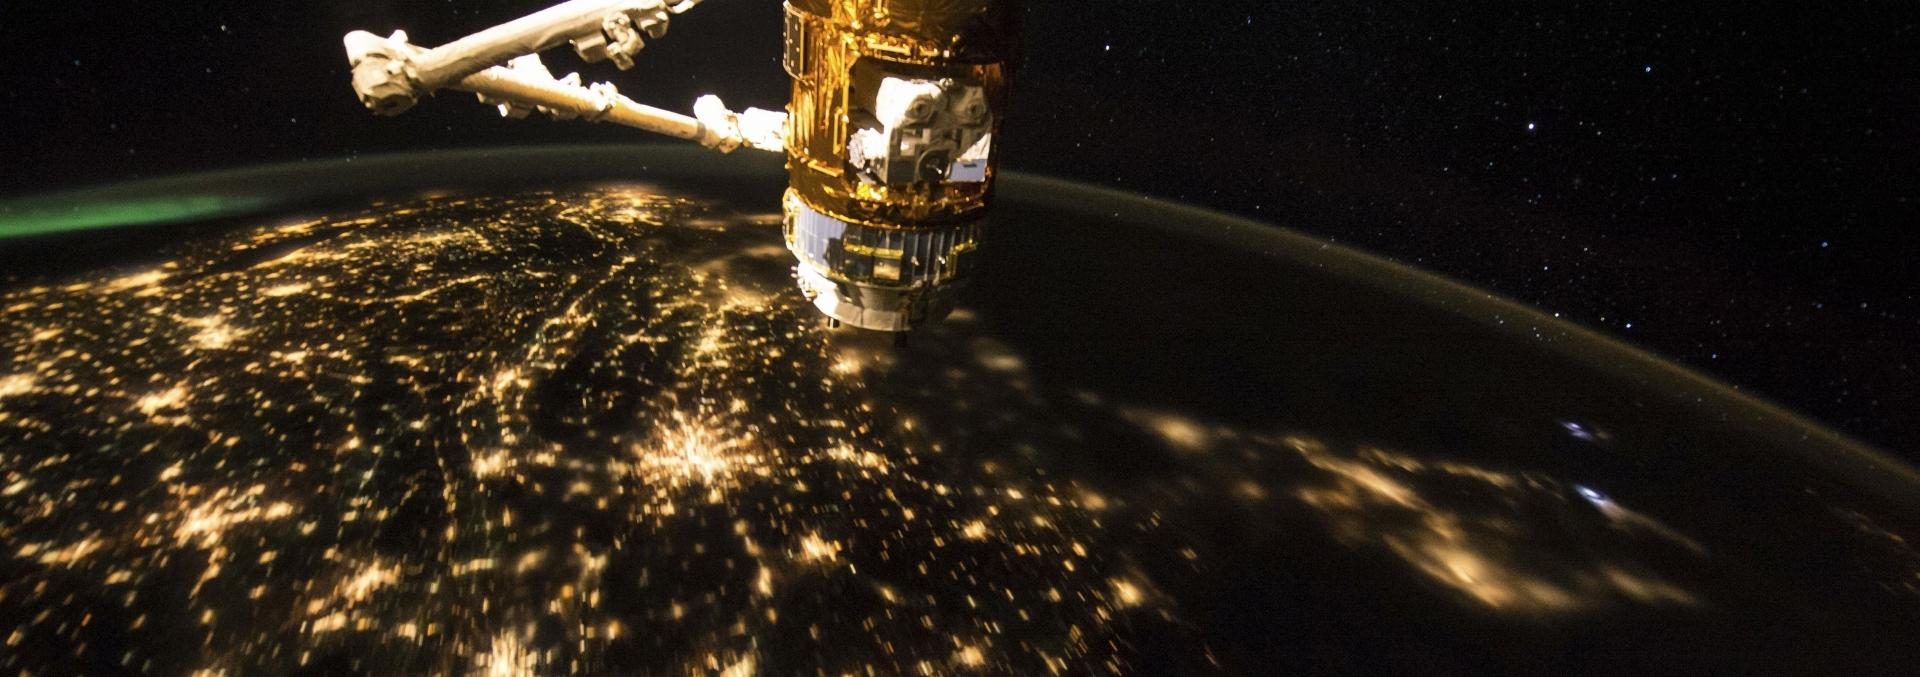 VIDEO: Fantastične snimke Zemlje astronauta Scotta Kellya